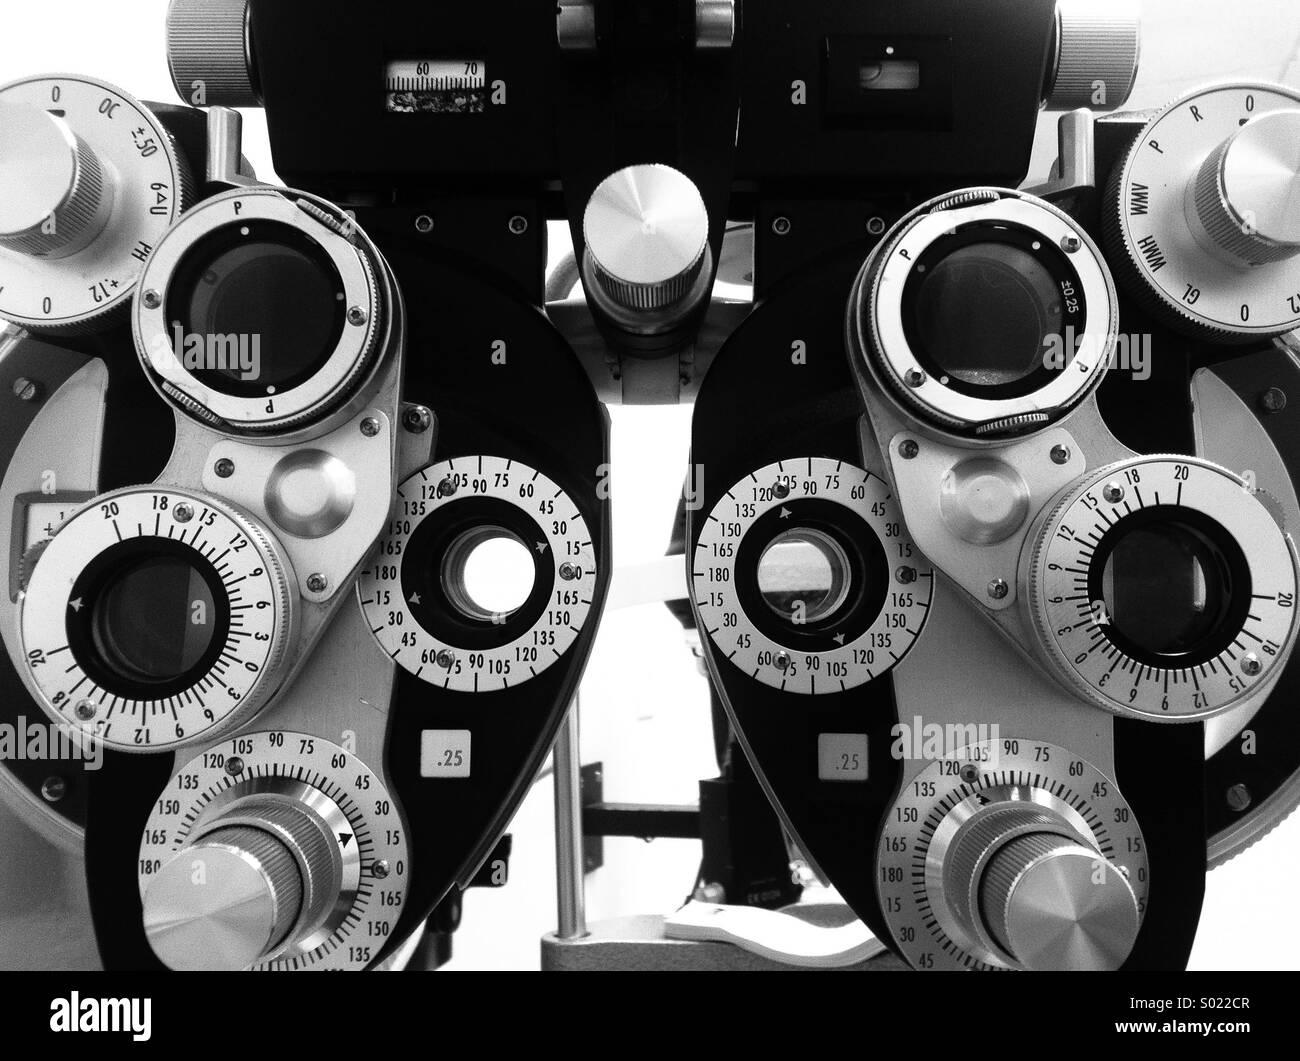 Eye Examination Black and White Stock Photos & Images - Alamy